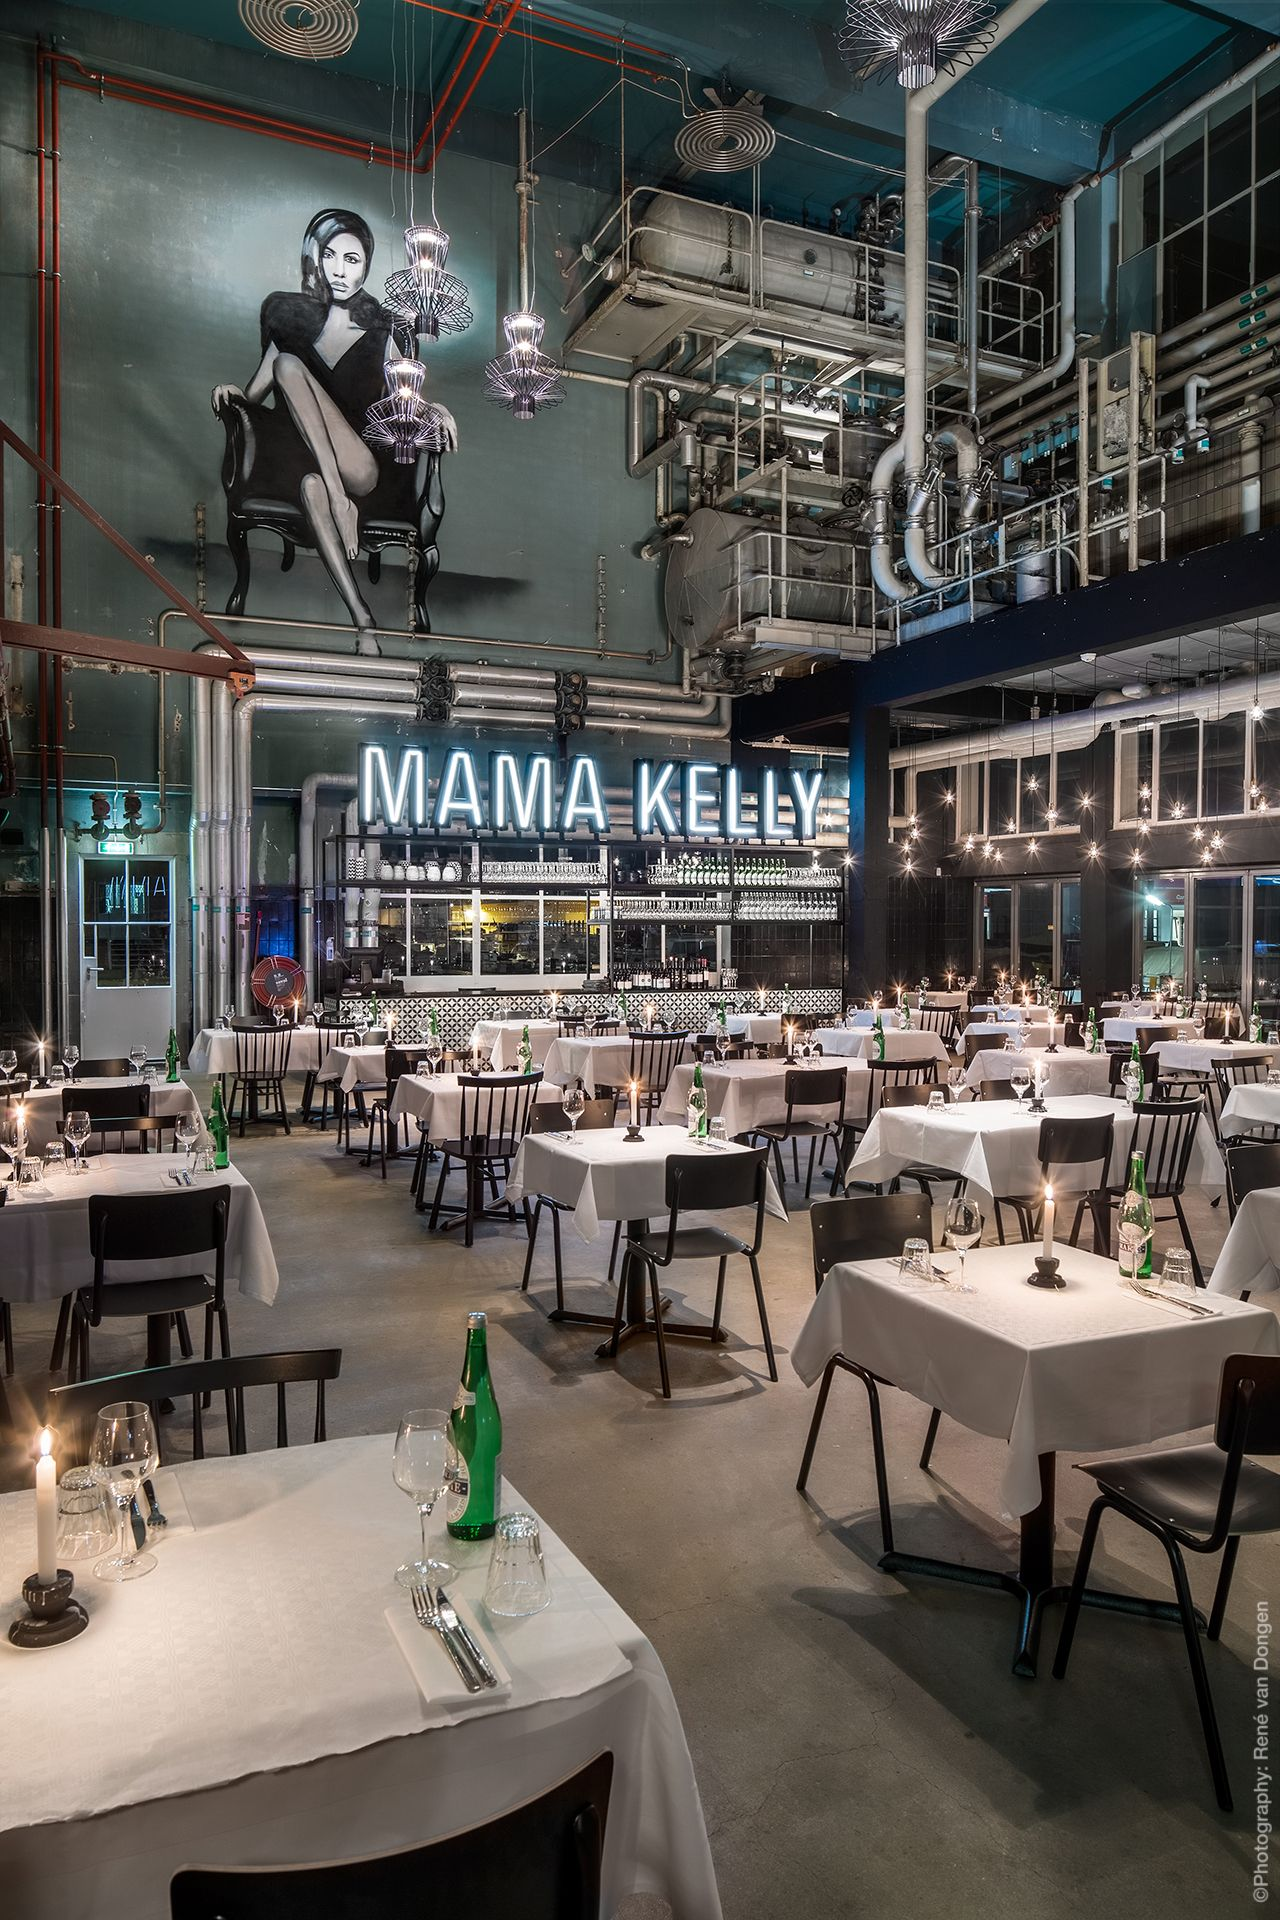 MaMa Kelly The Hague (Netherlands). Design by Rein Rambaldo (De ...